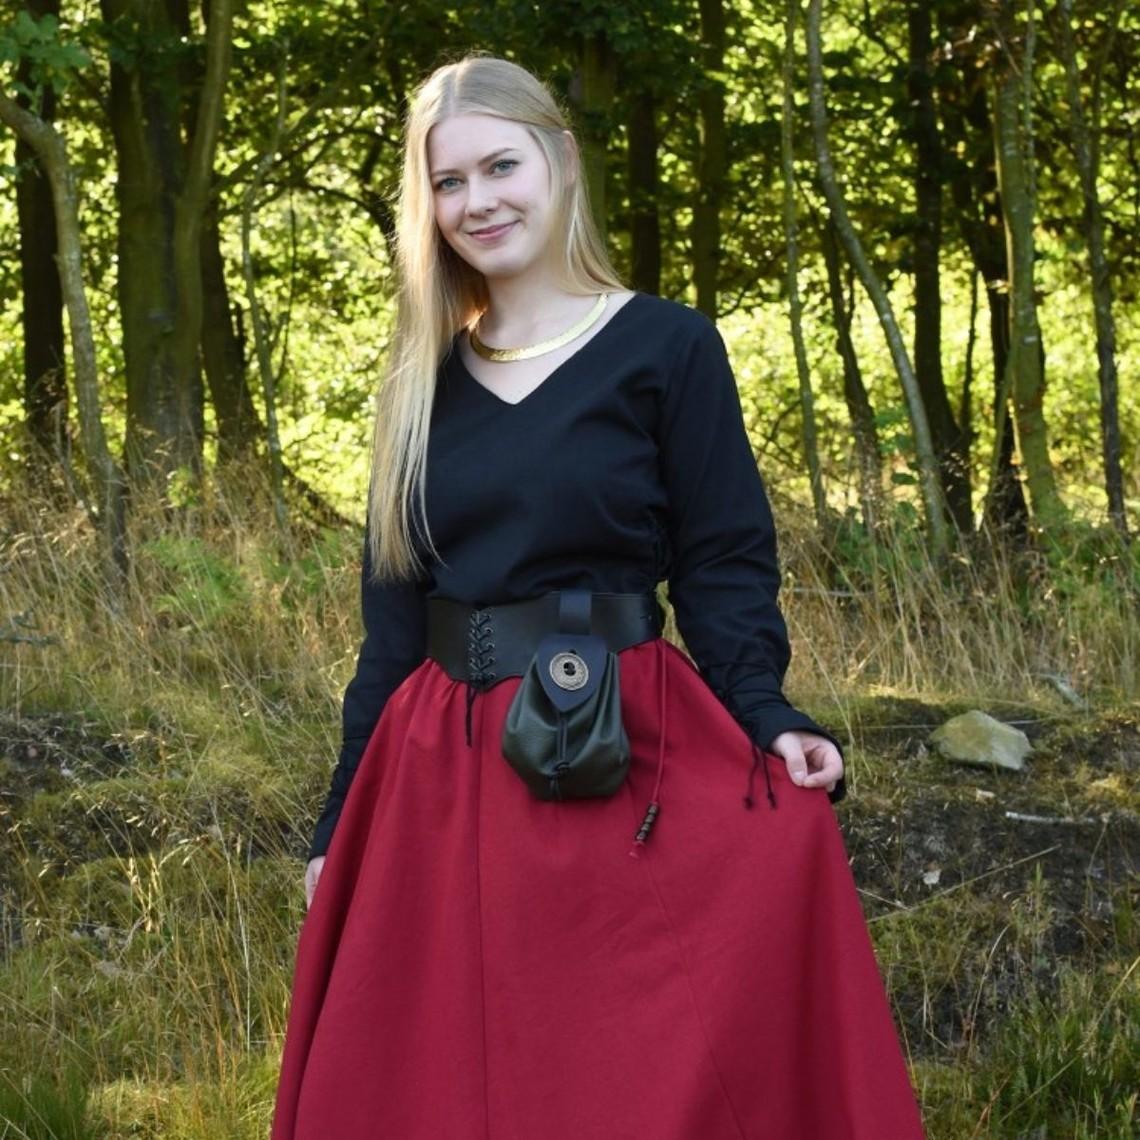 Medieval Aubrey bluzka, czarna